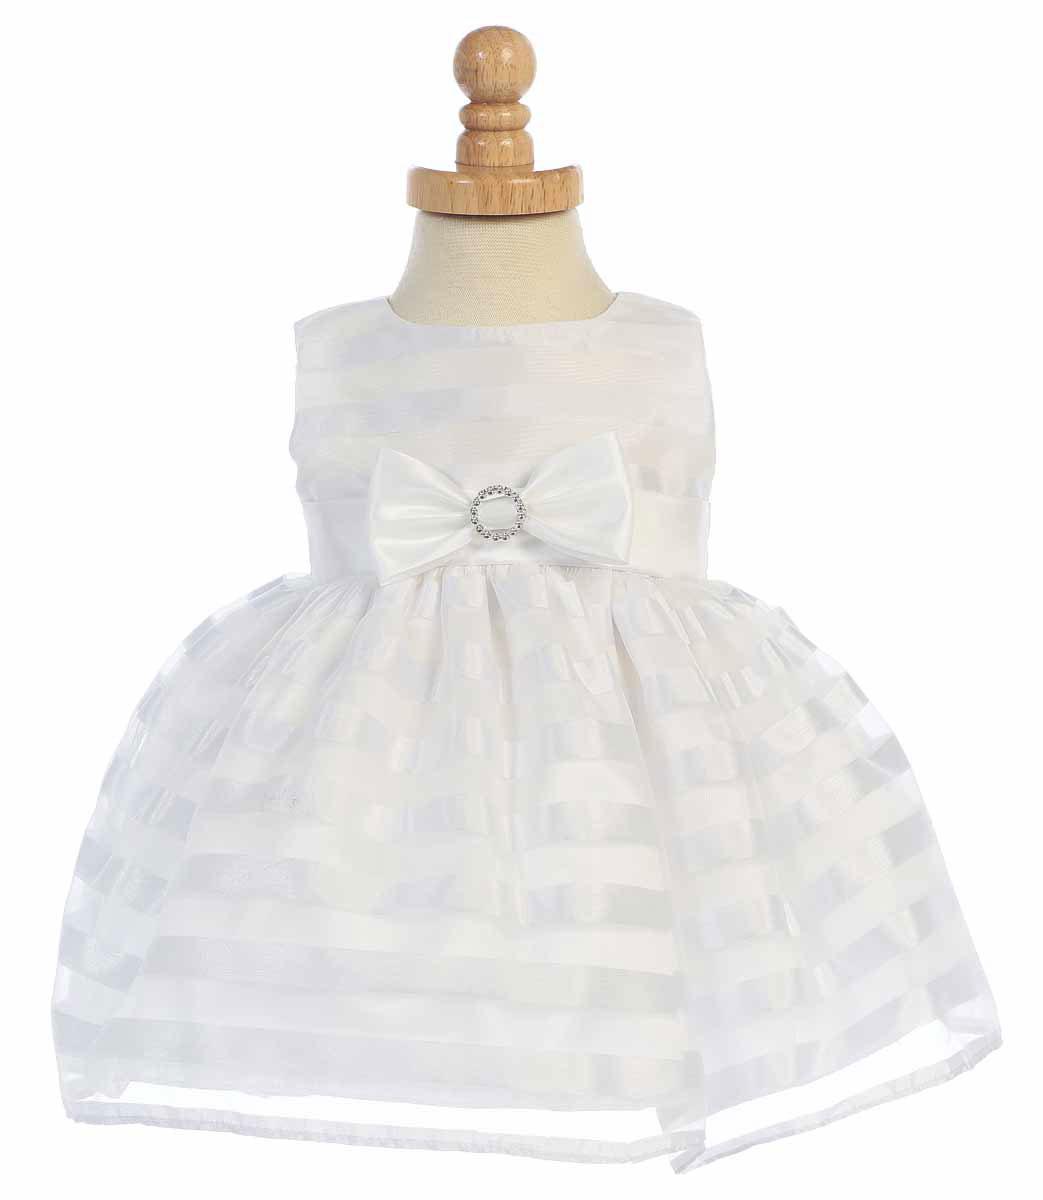 L M643 Girls Dress Style M643 WHITE Striped Organza Sleeveless Dress Whi